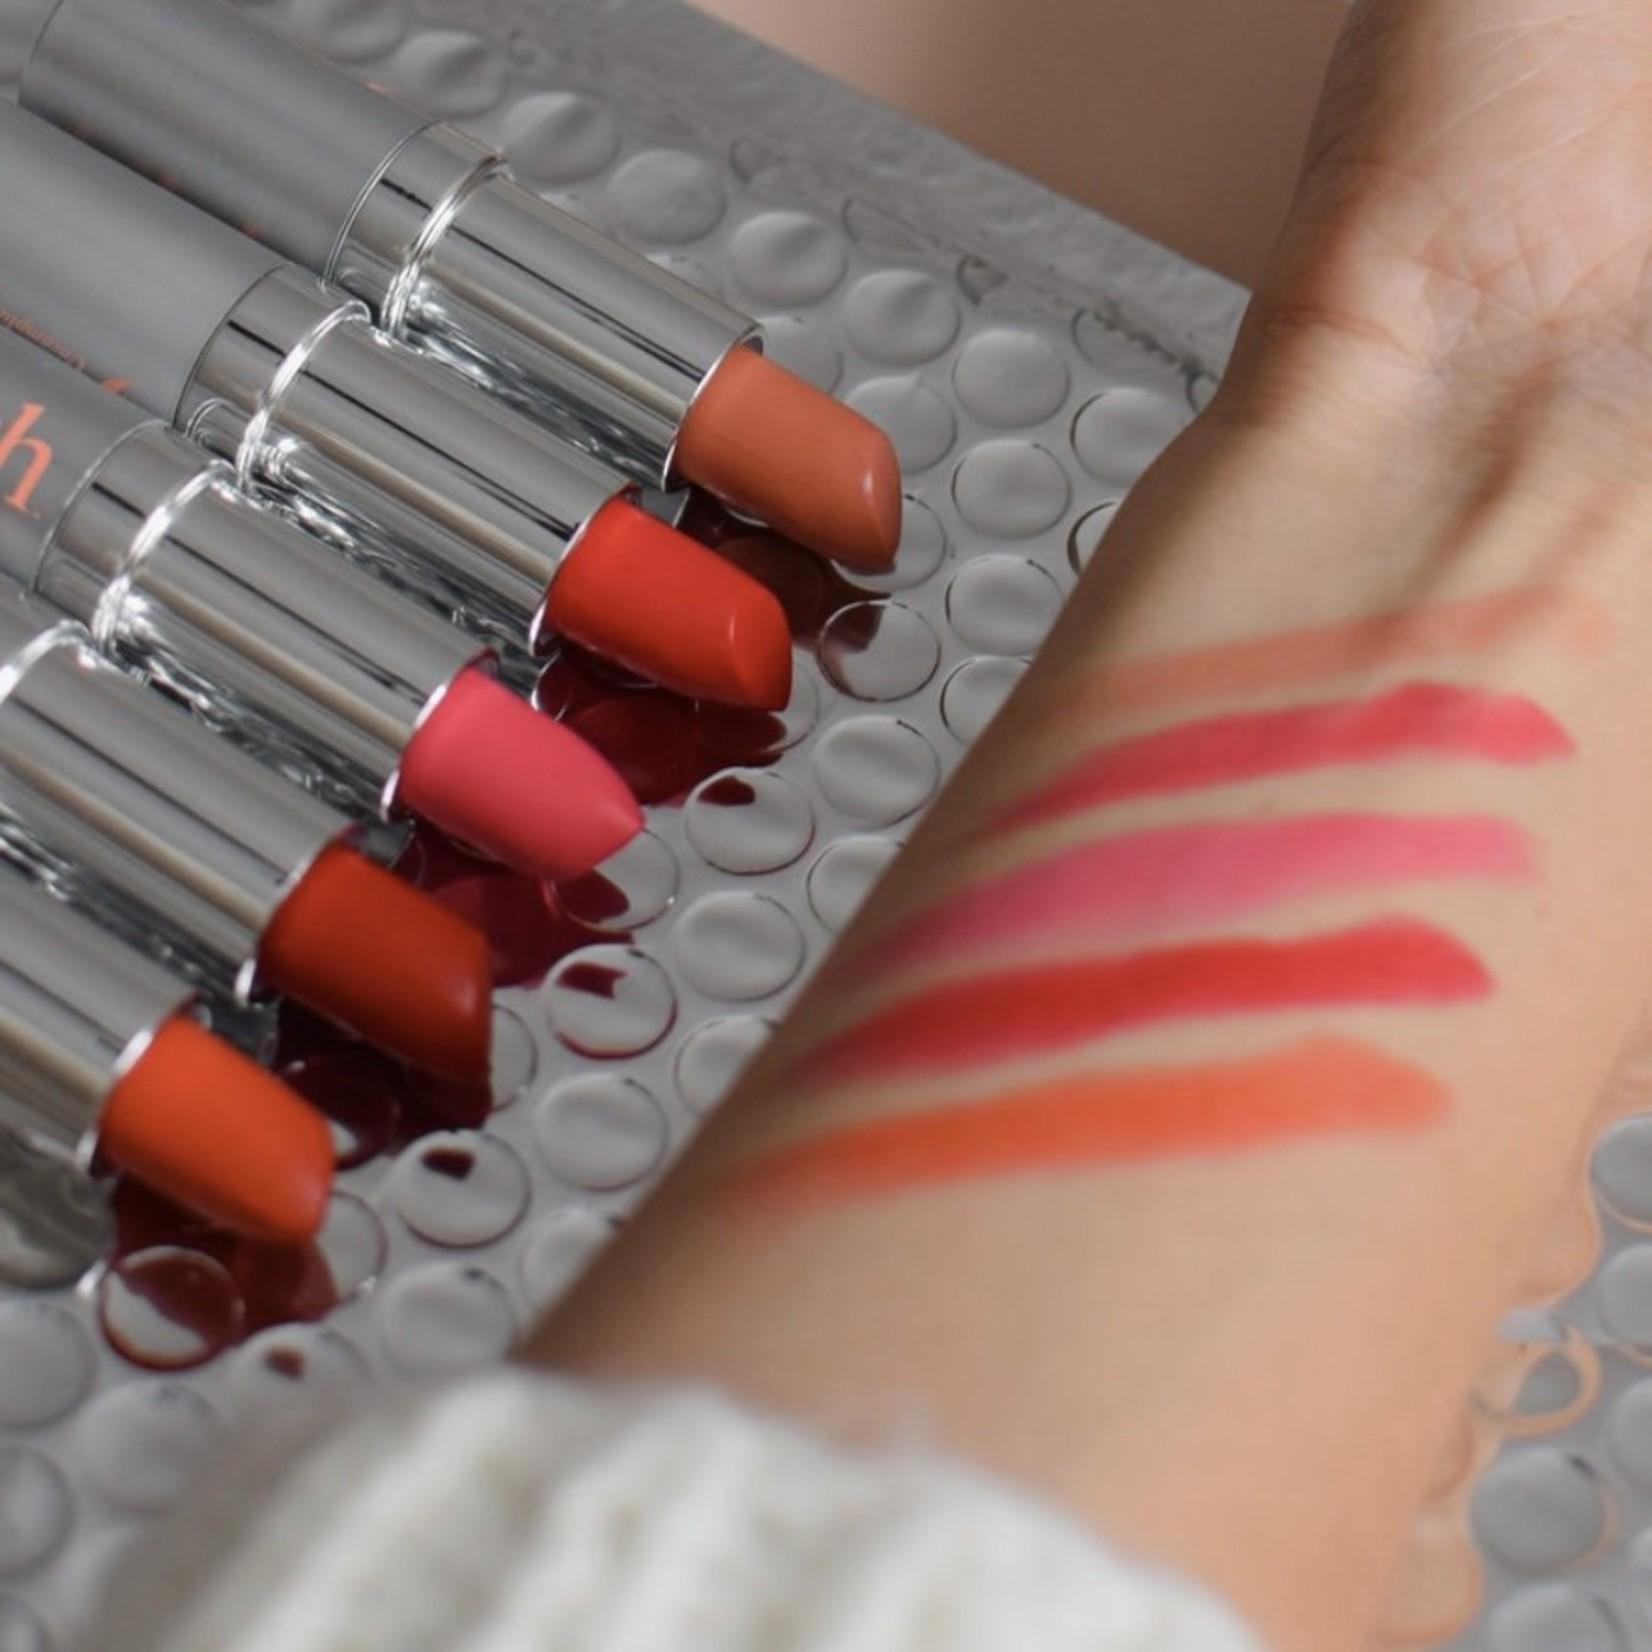 Dalish Dalish Lipstick - L04 Vintage Red